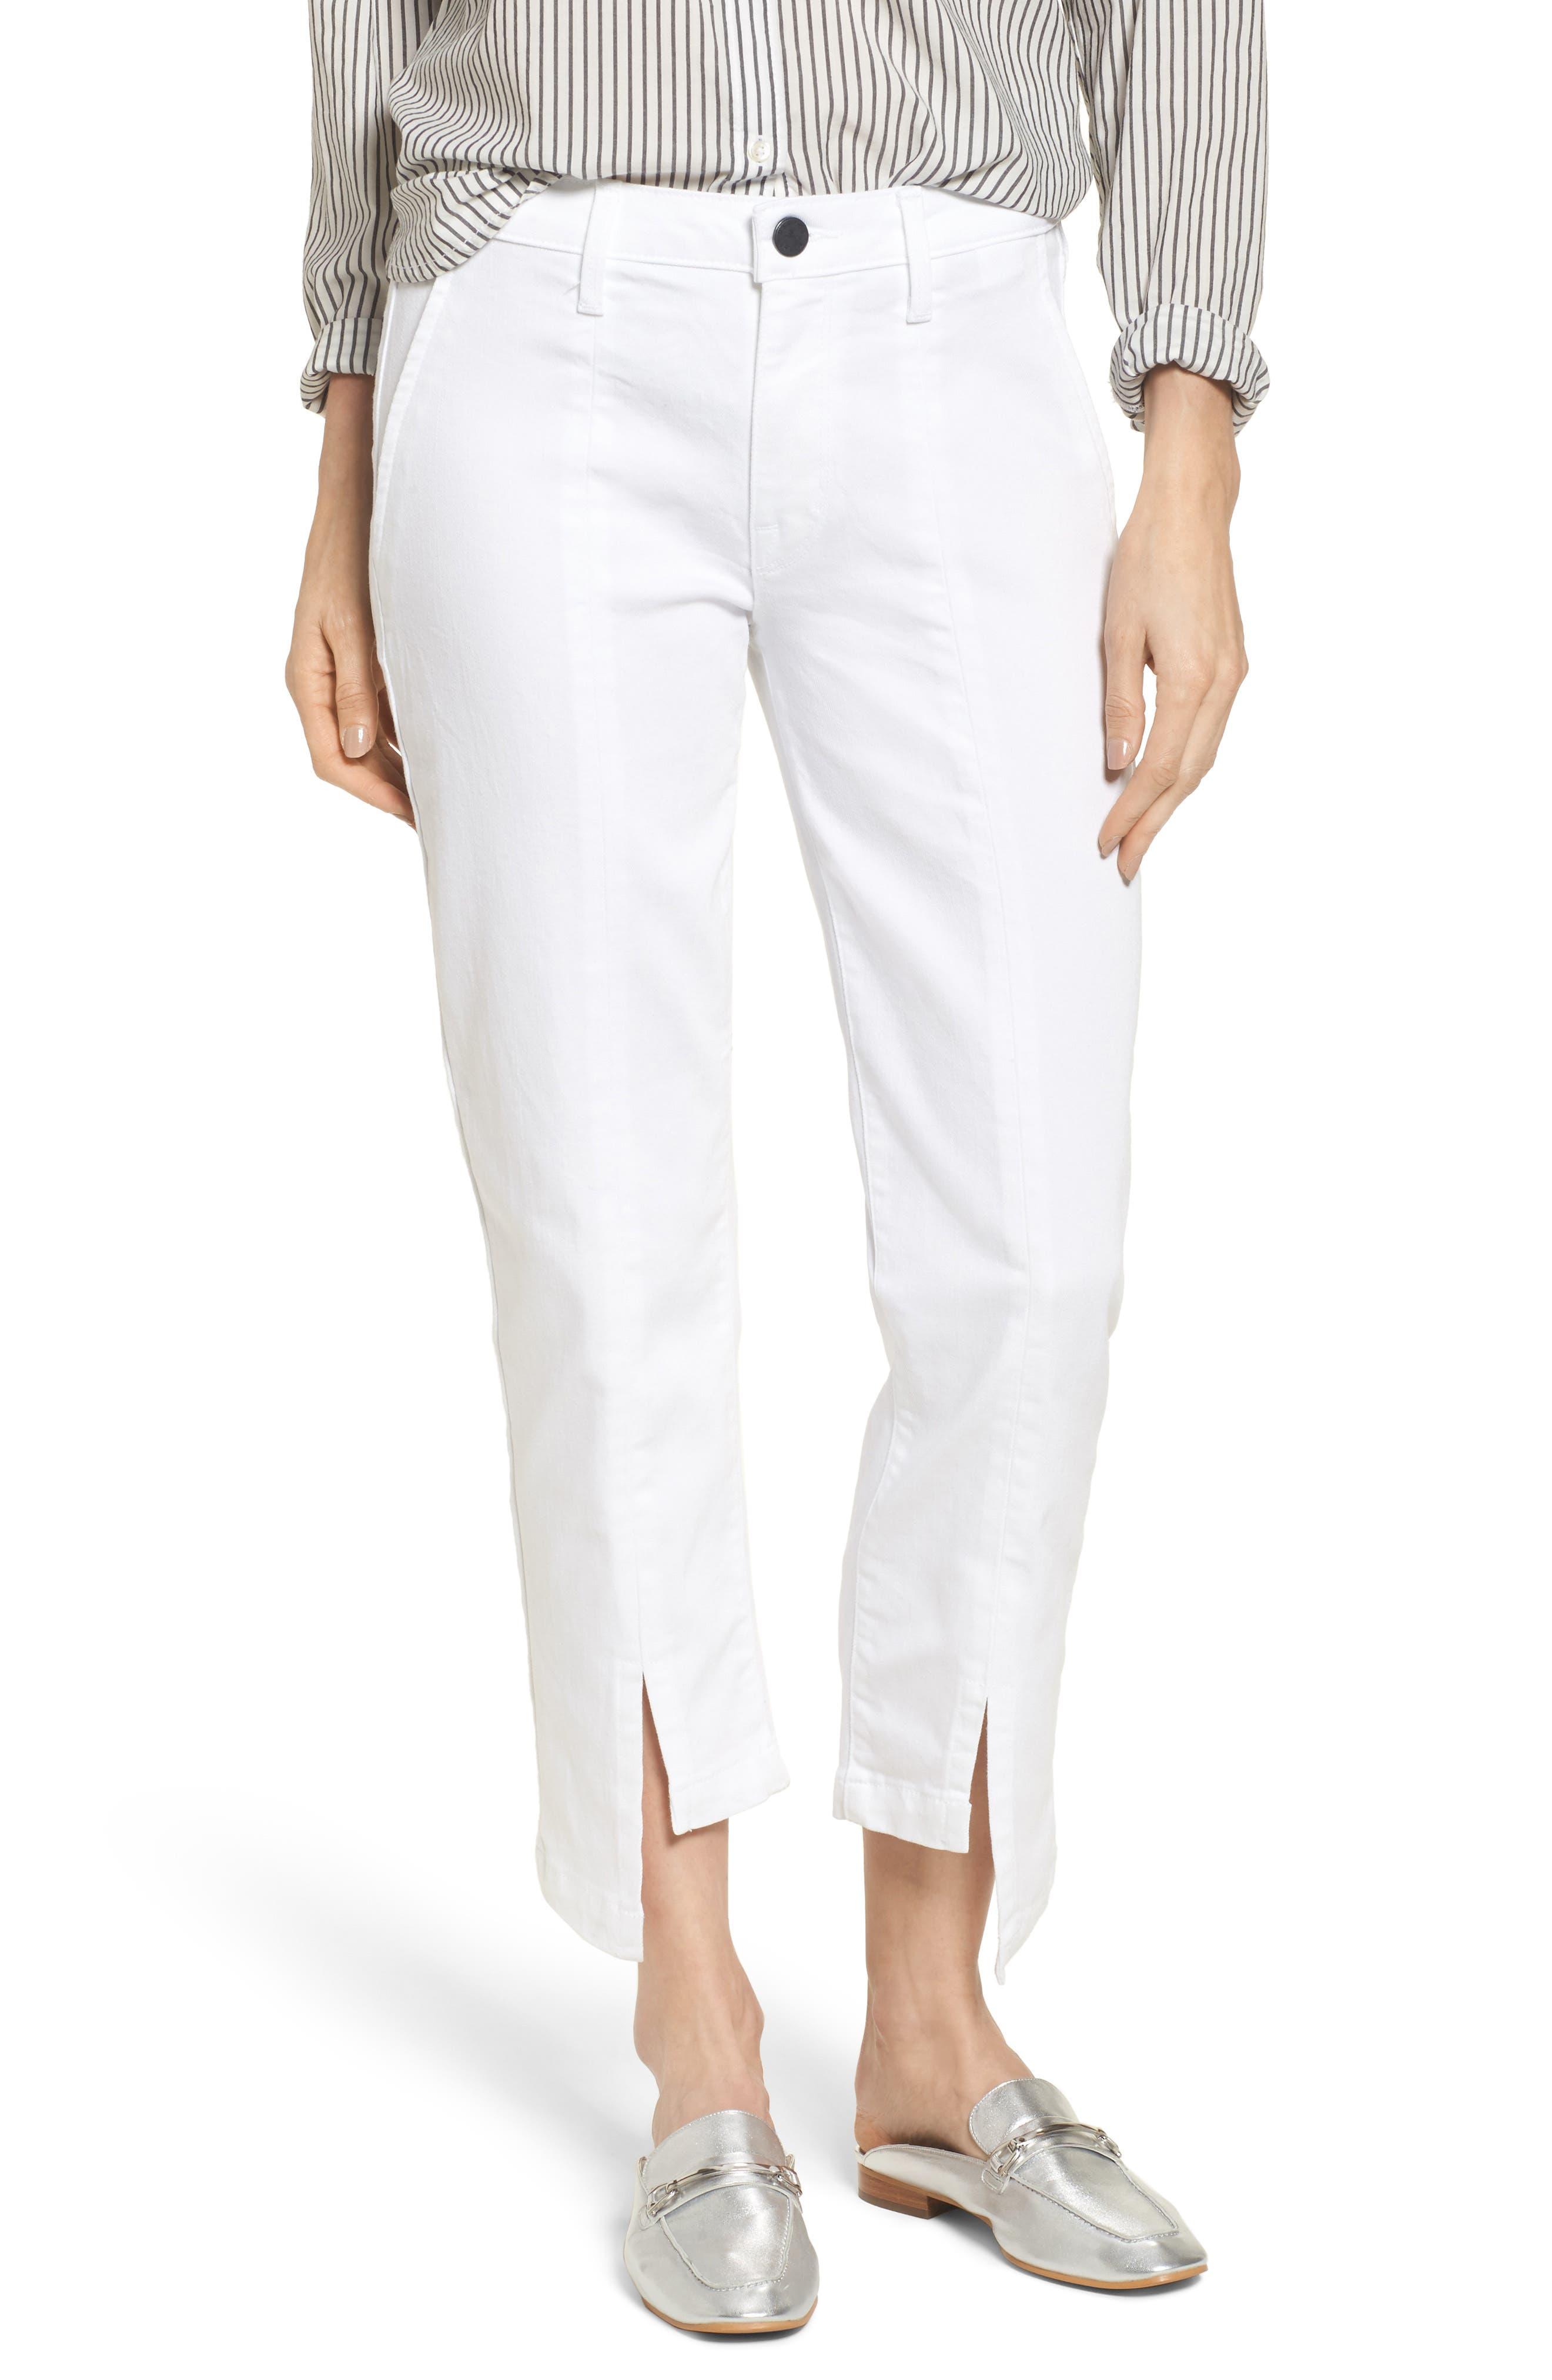 PARKER SMITH Novak High/Low Hem Trousers